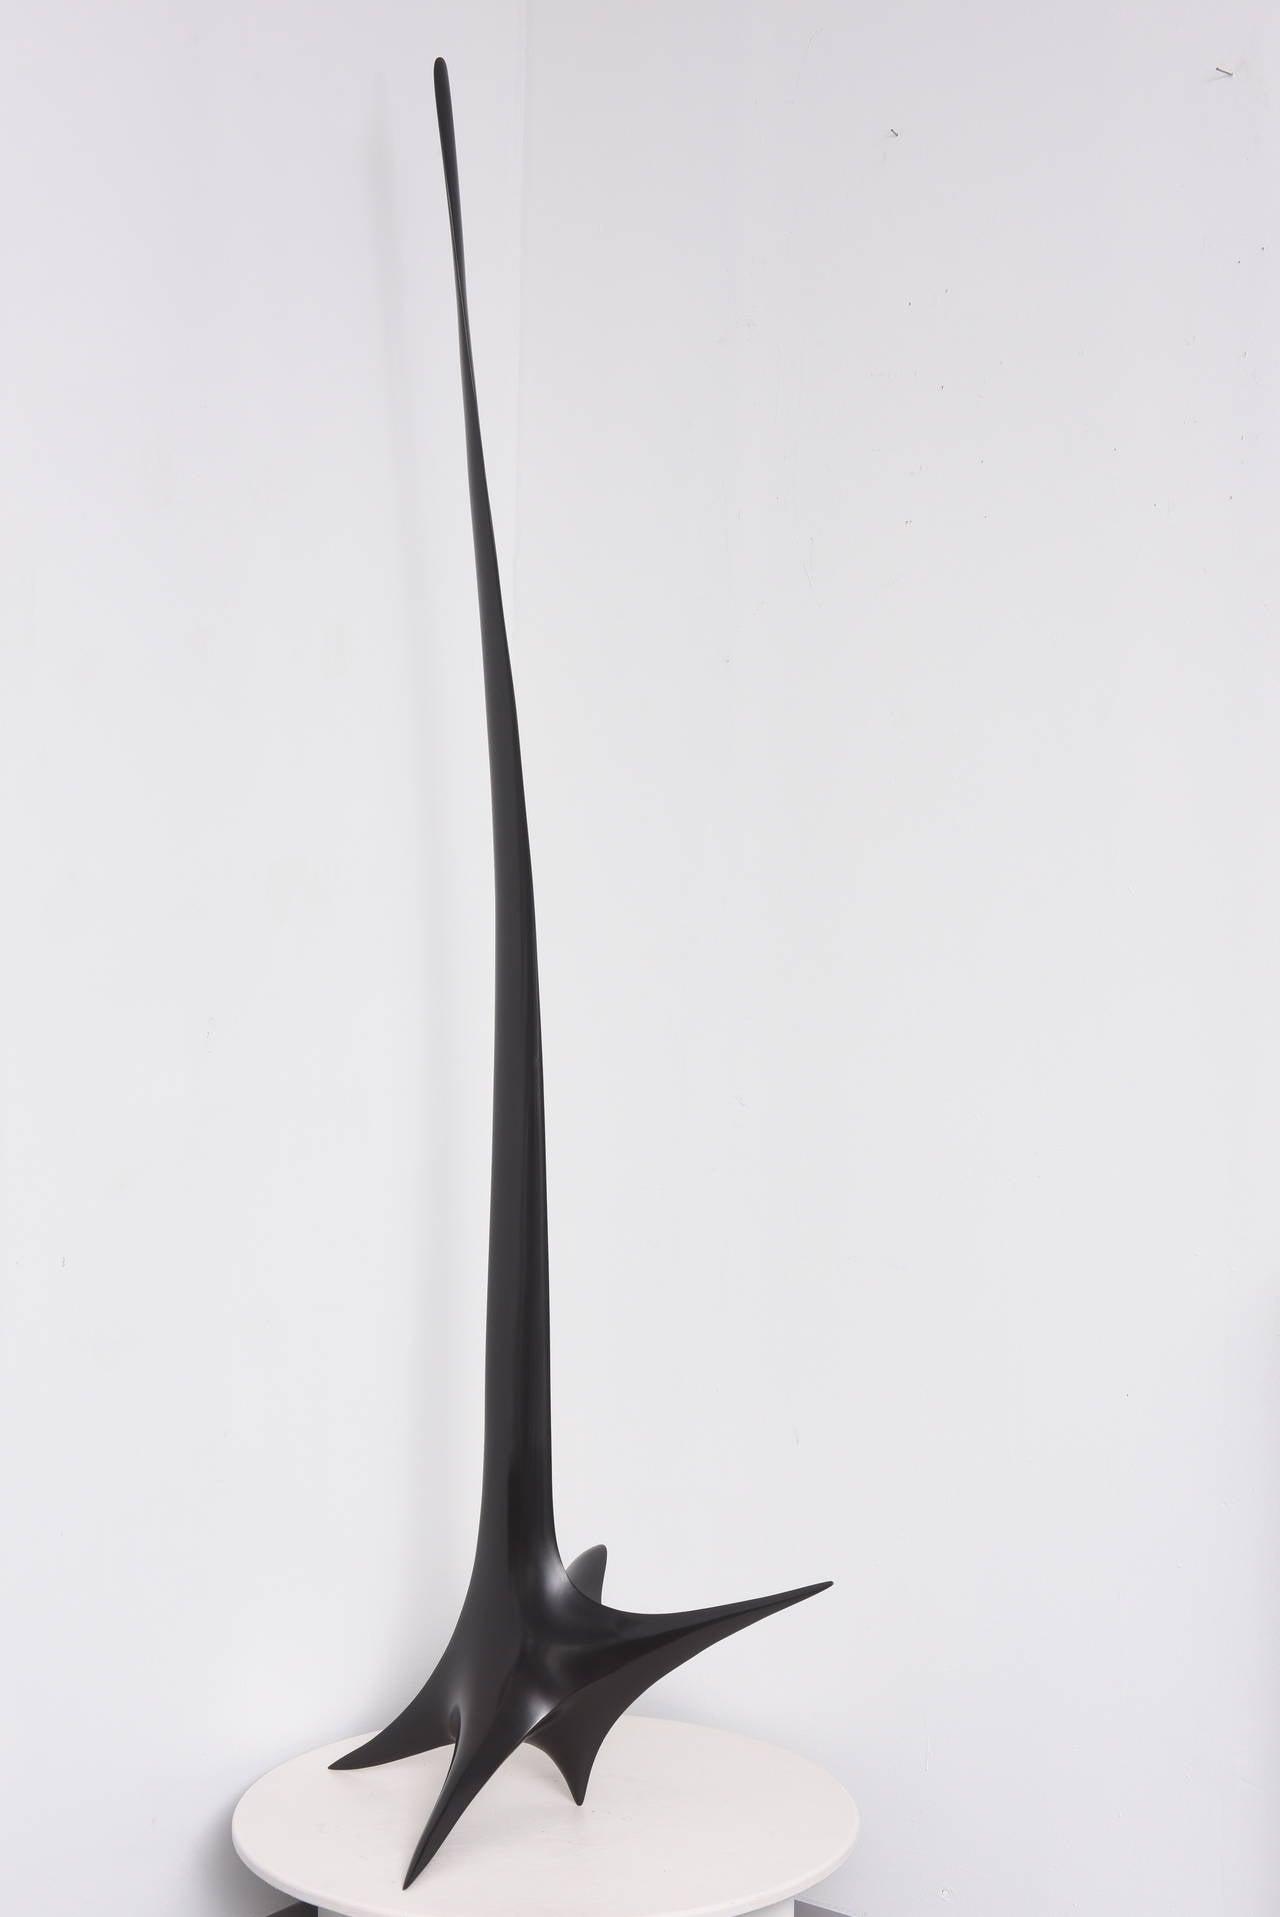 Icare - Gold Figurative Sculpture by Patrice Breteau